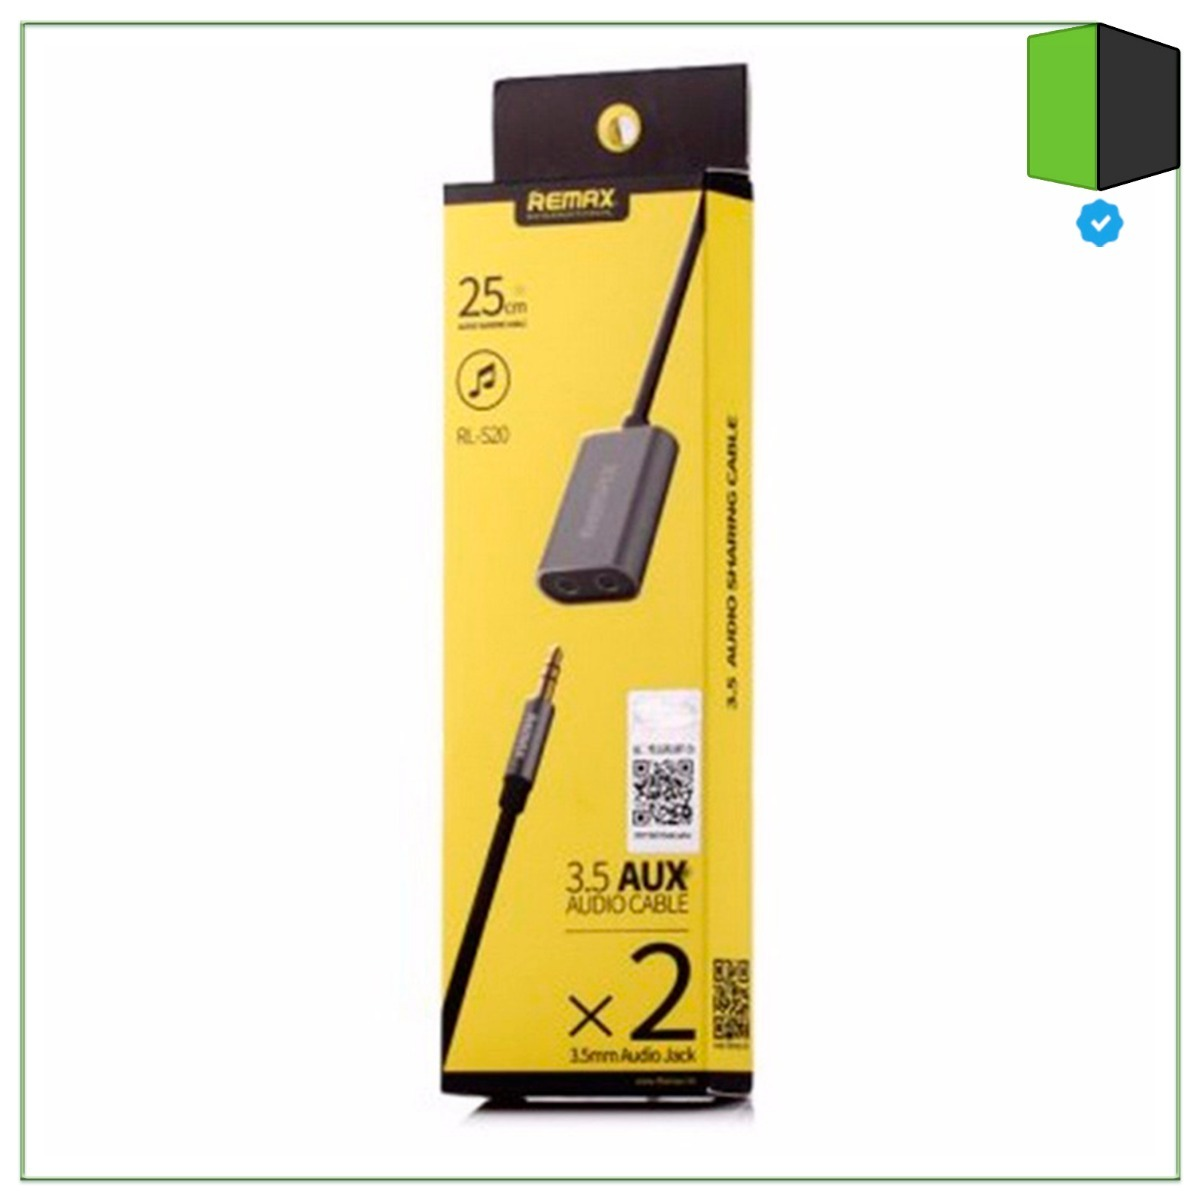 Adaptador Audio 35 Mm Miniplug Remax Rl 205 Doble Stereo 34999 Aux Cable 20s Cargando Zoom